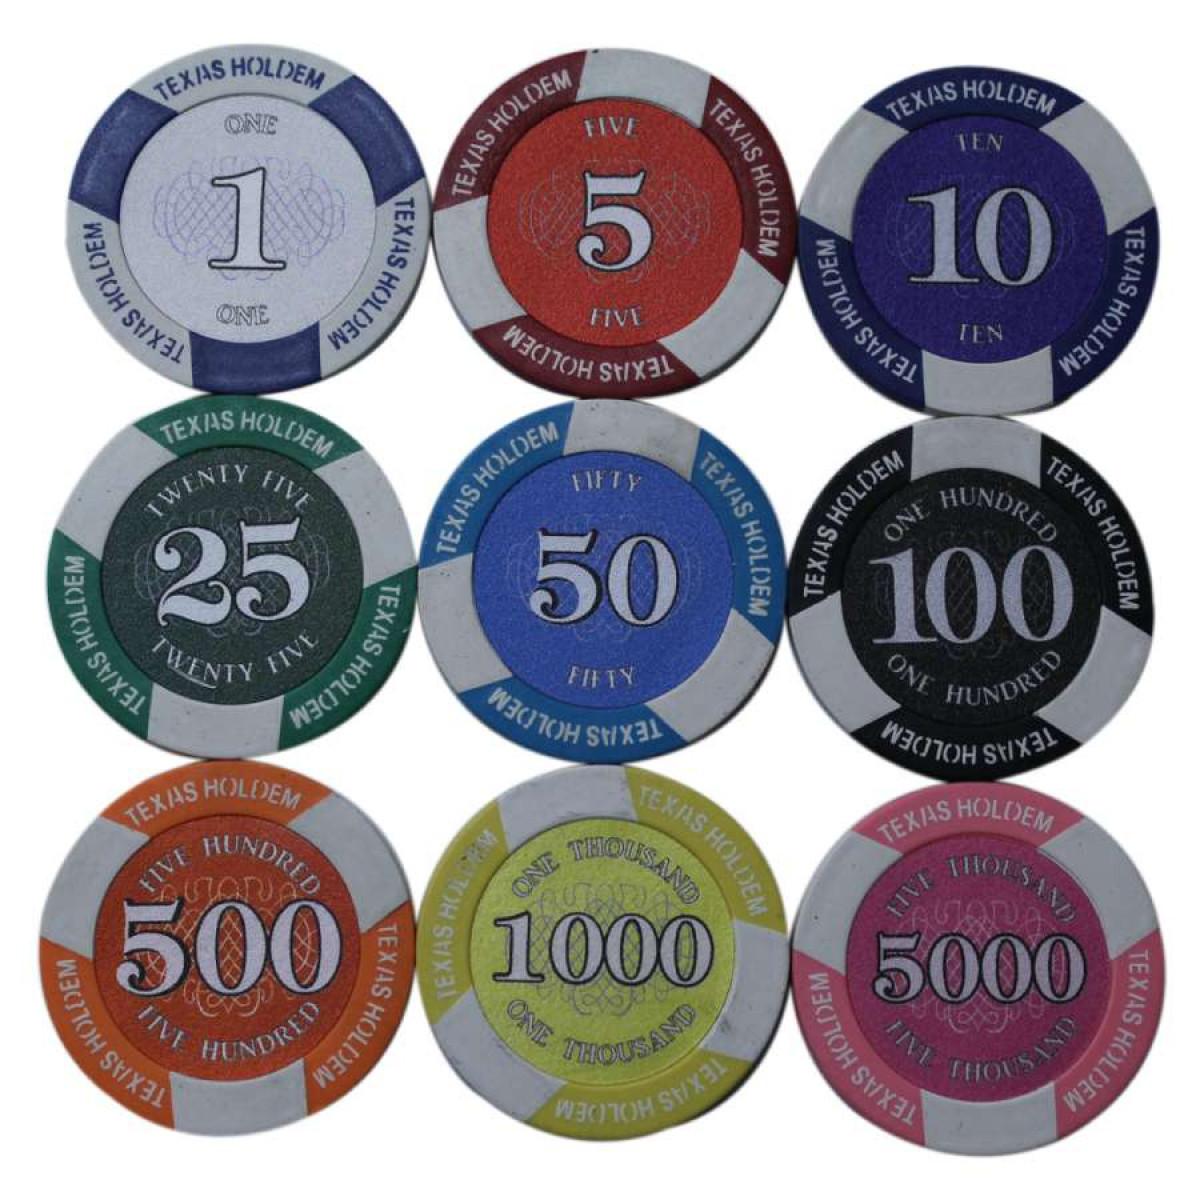 Prestige Casino Chips Poker Chip Sets Straight Poker